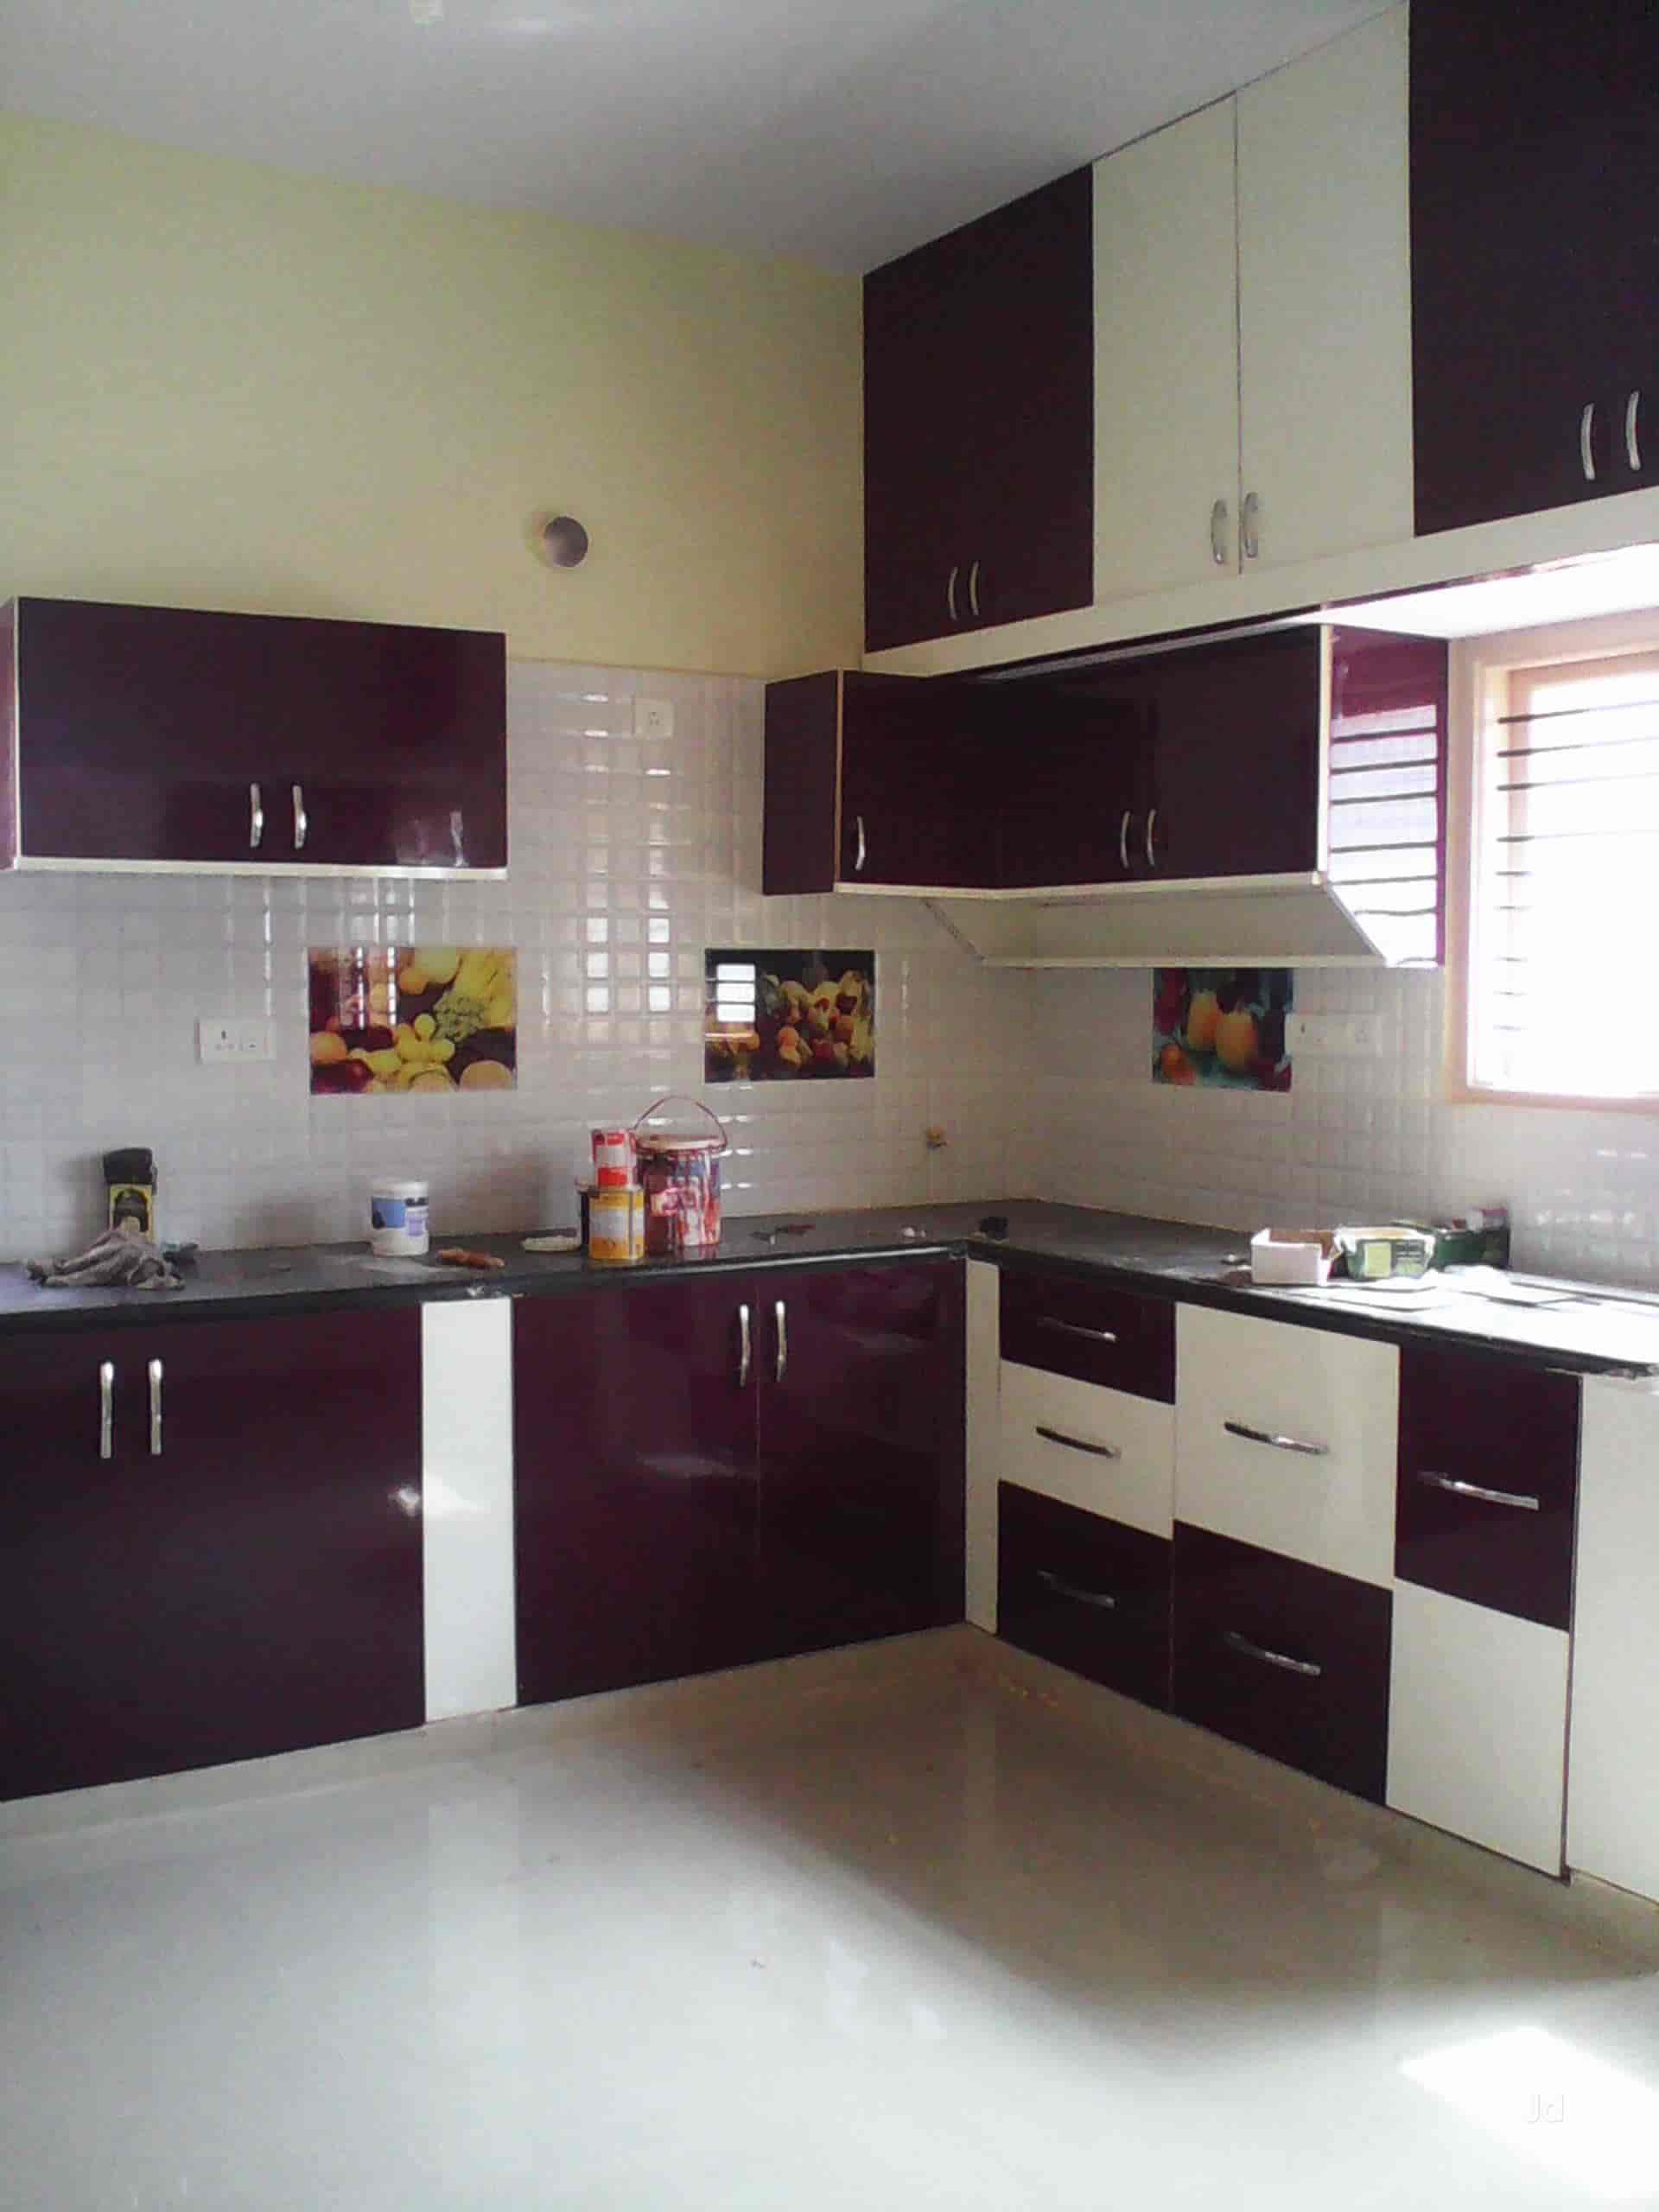 Sri Kalikamba Interiors Sunkadakatte Interior Designers in